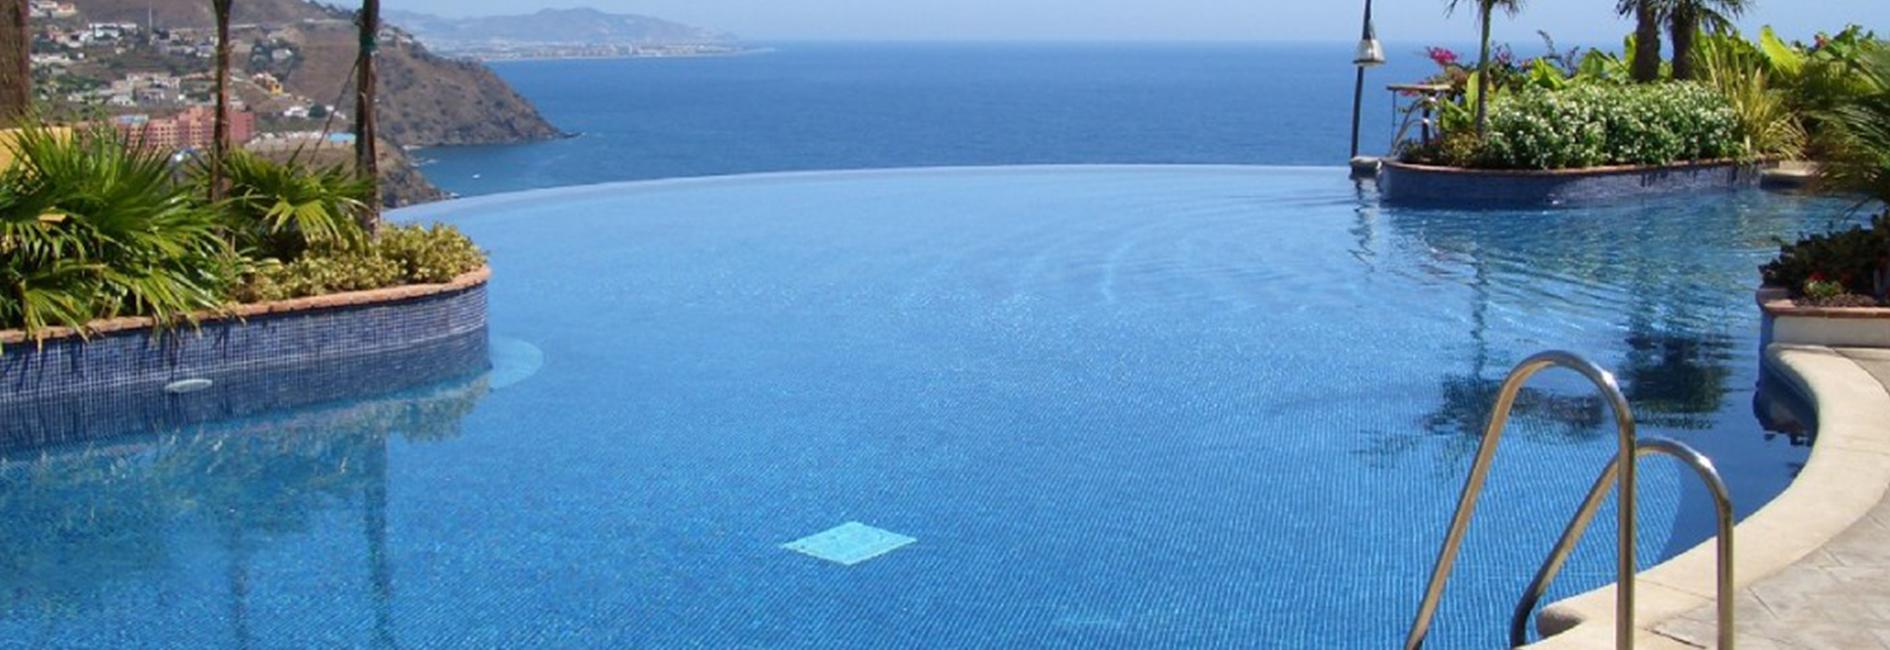 Casa Palmeras Infinity pool